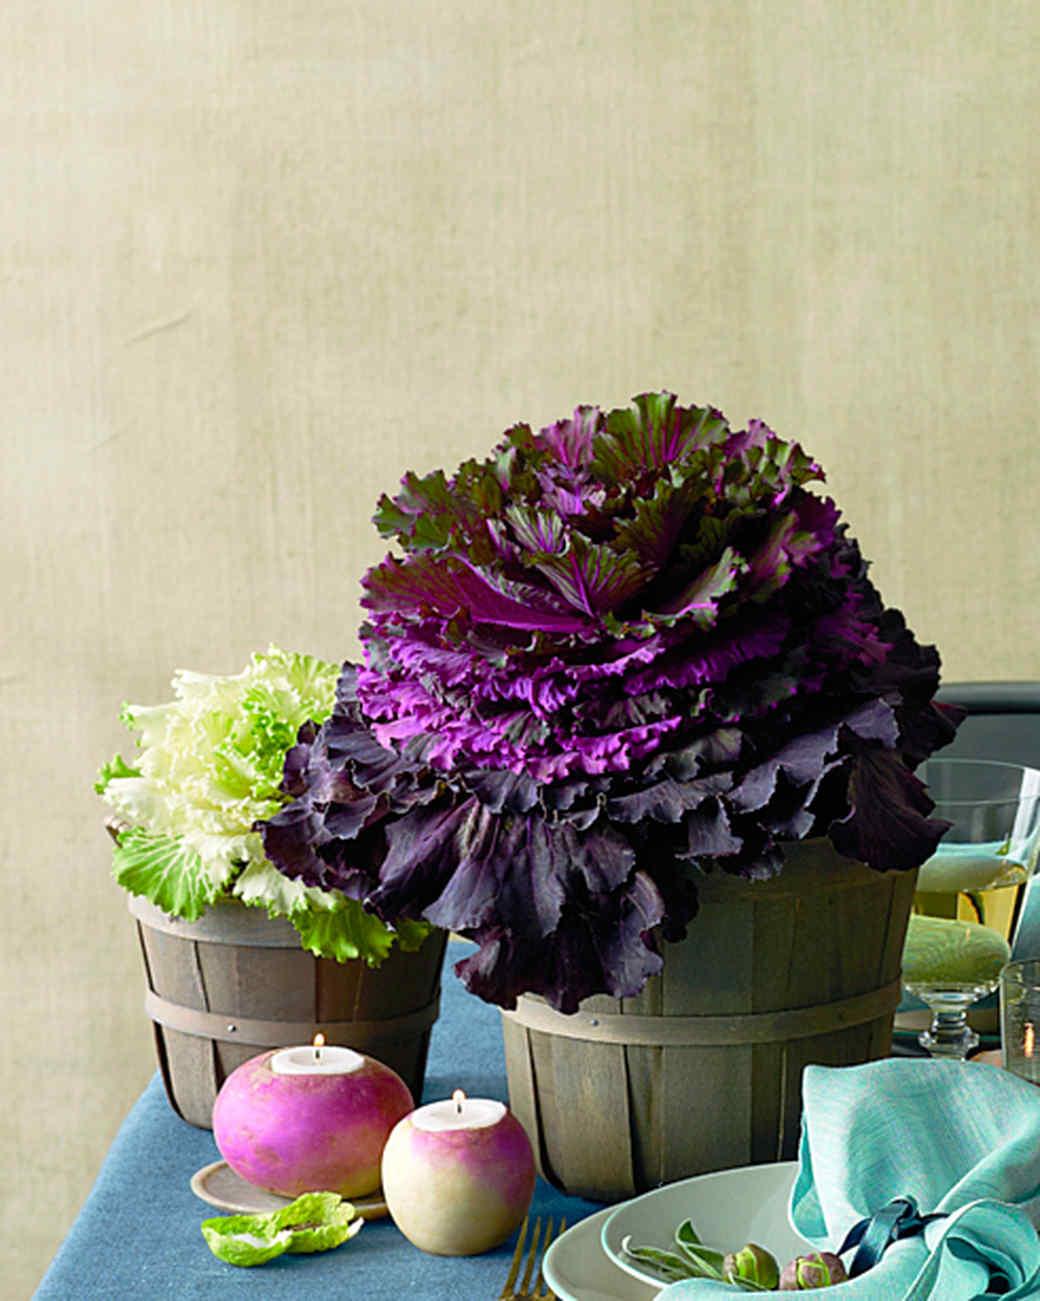 vegetable-thanksgiving-basket-mld106974.jpg